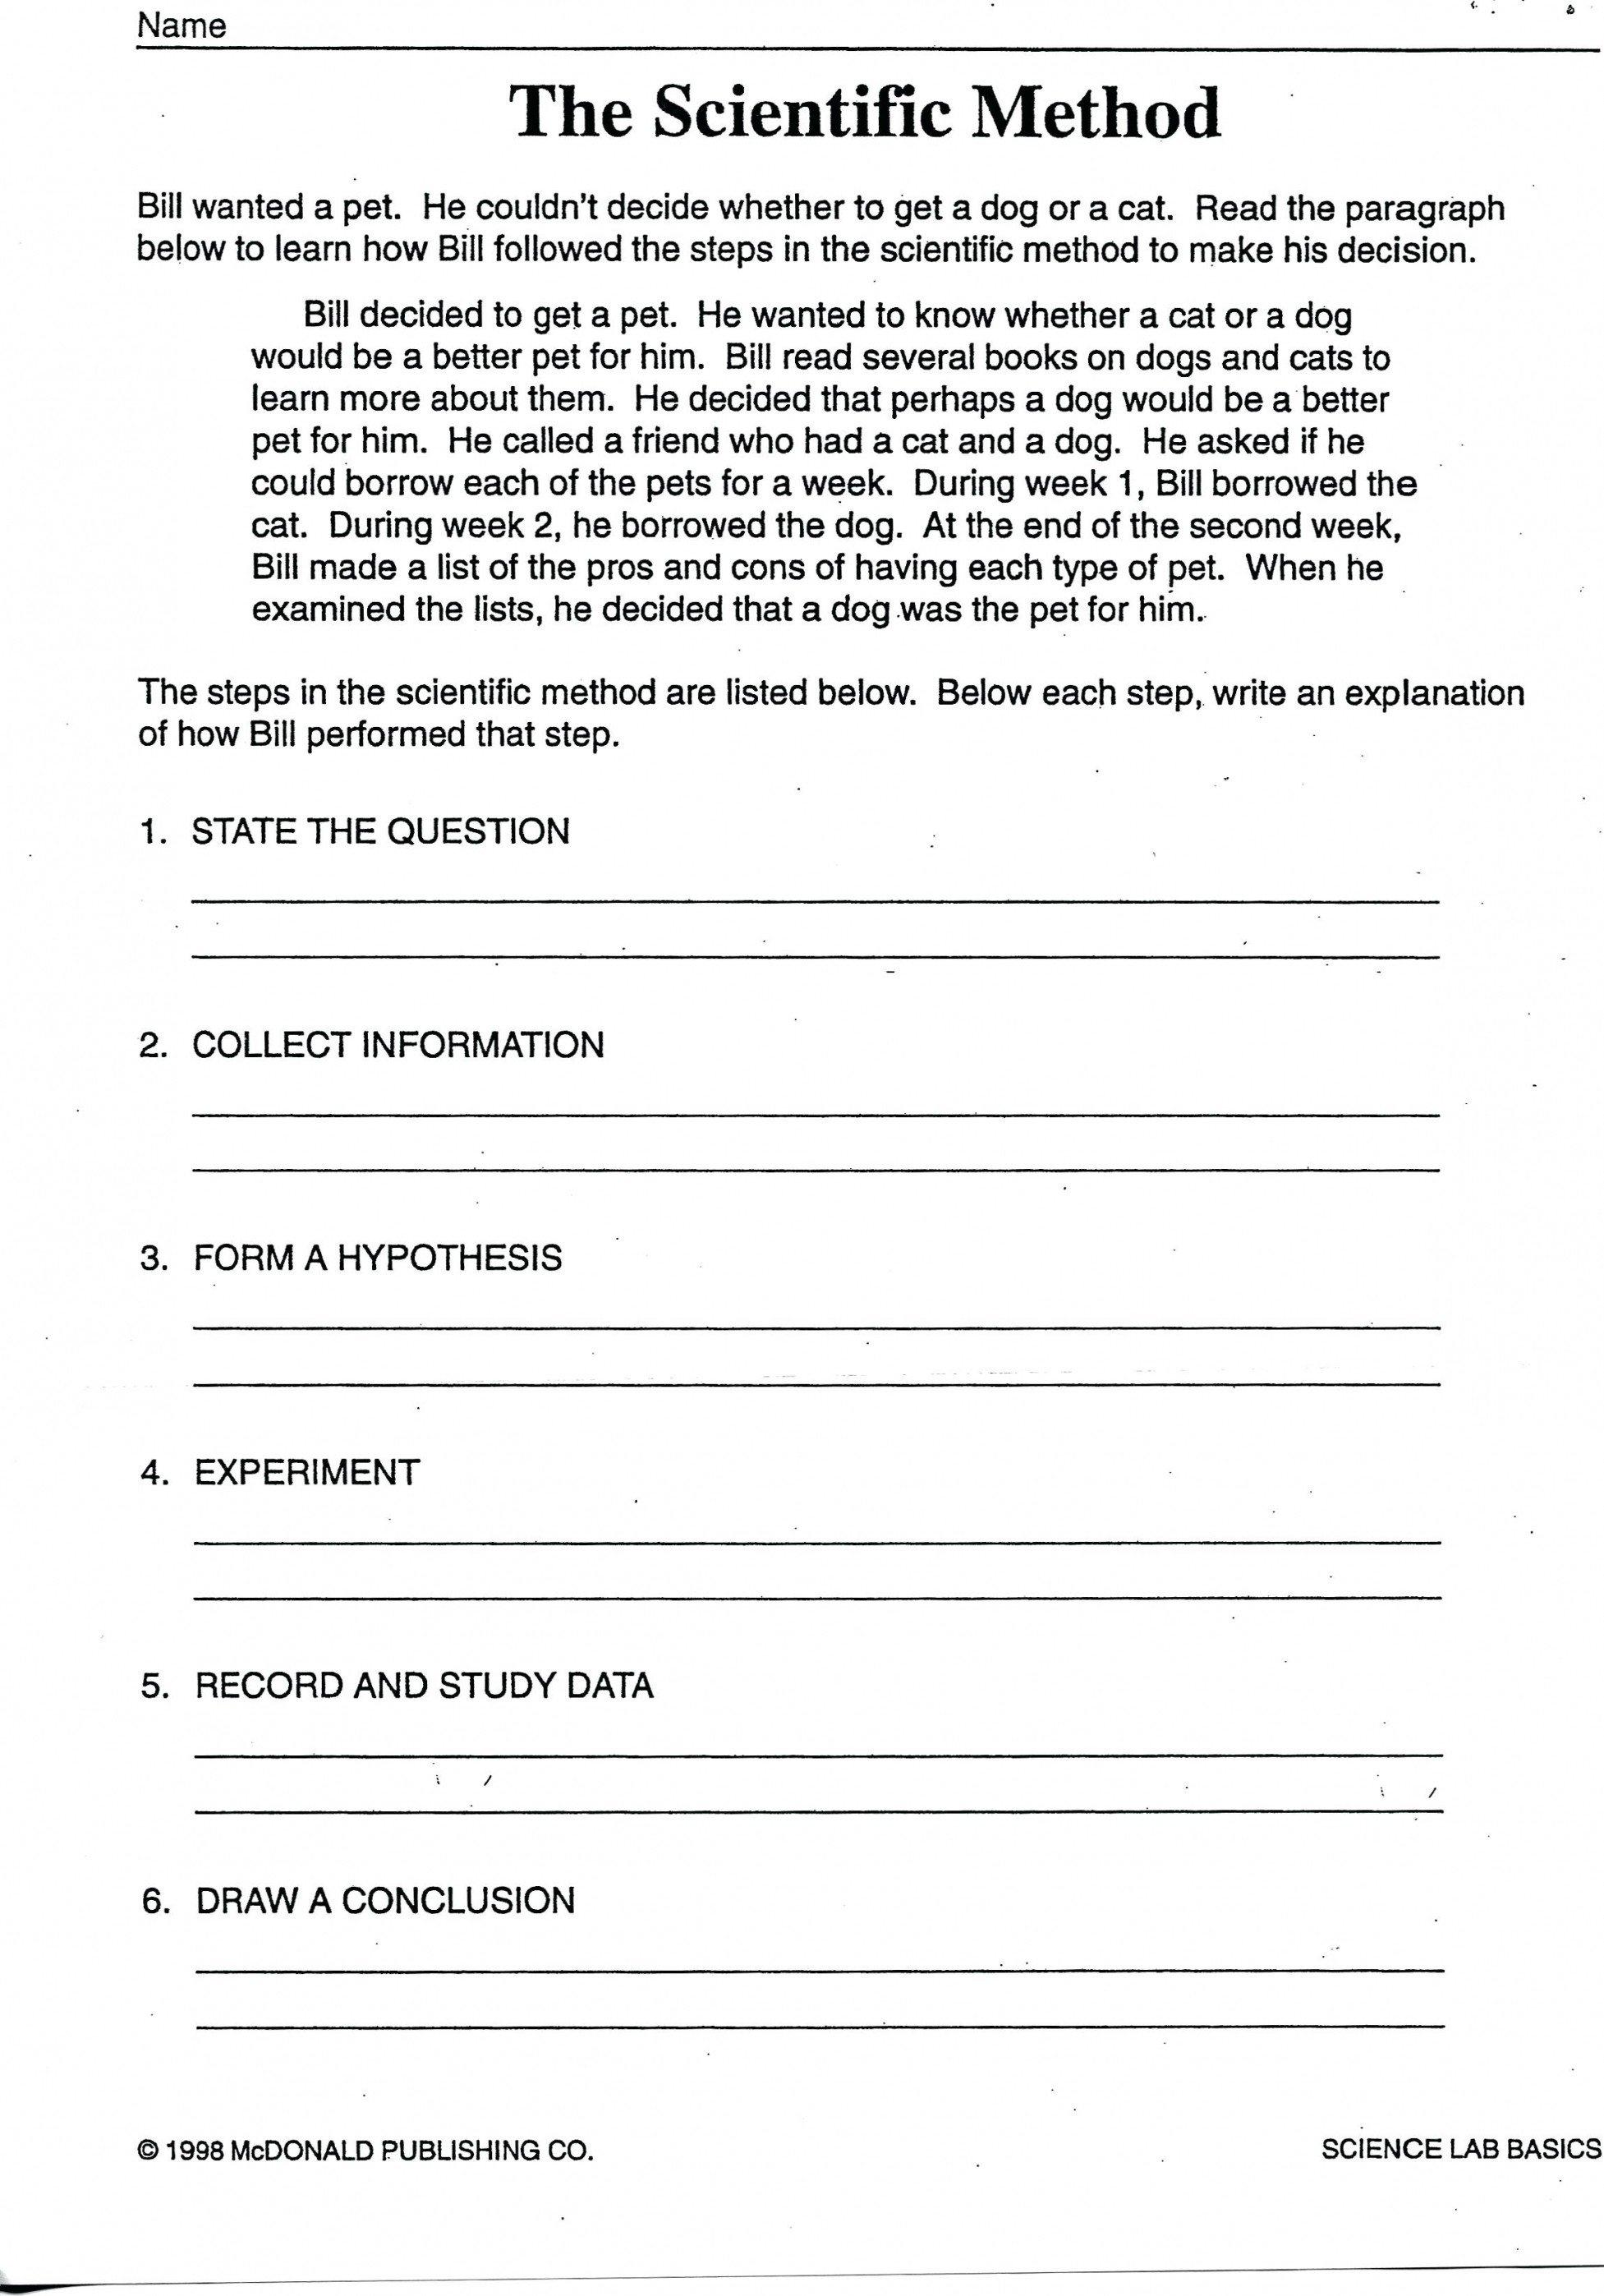 Experimental Design Worksheet Scientific Method  Newatvs For Experimental Design Worksheet Scientific Method